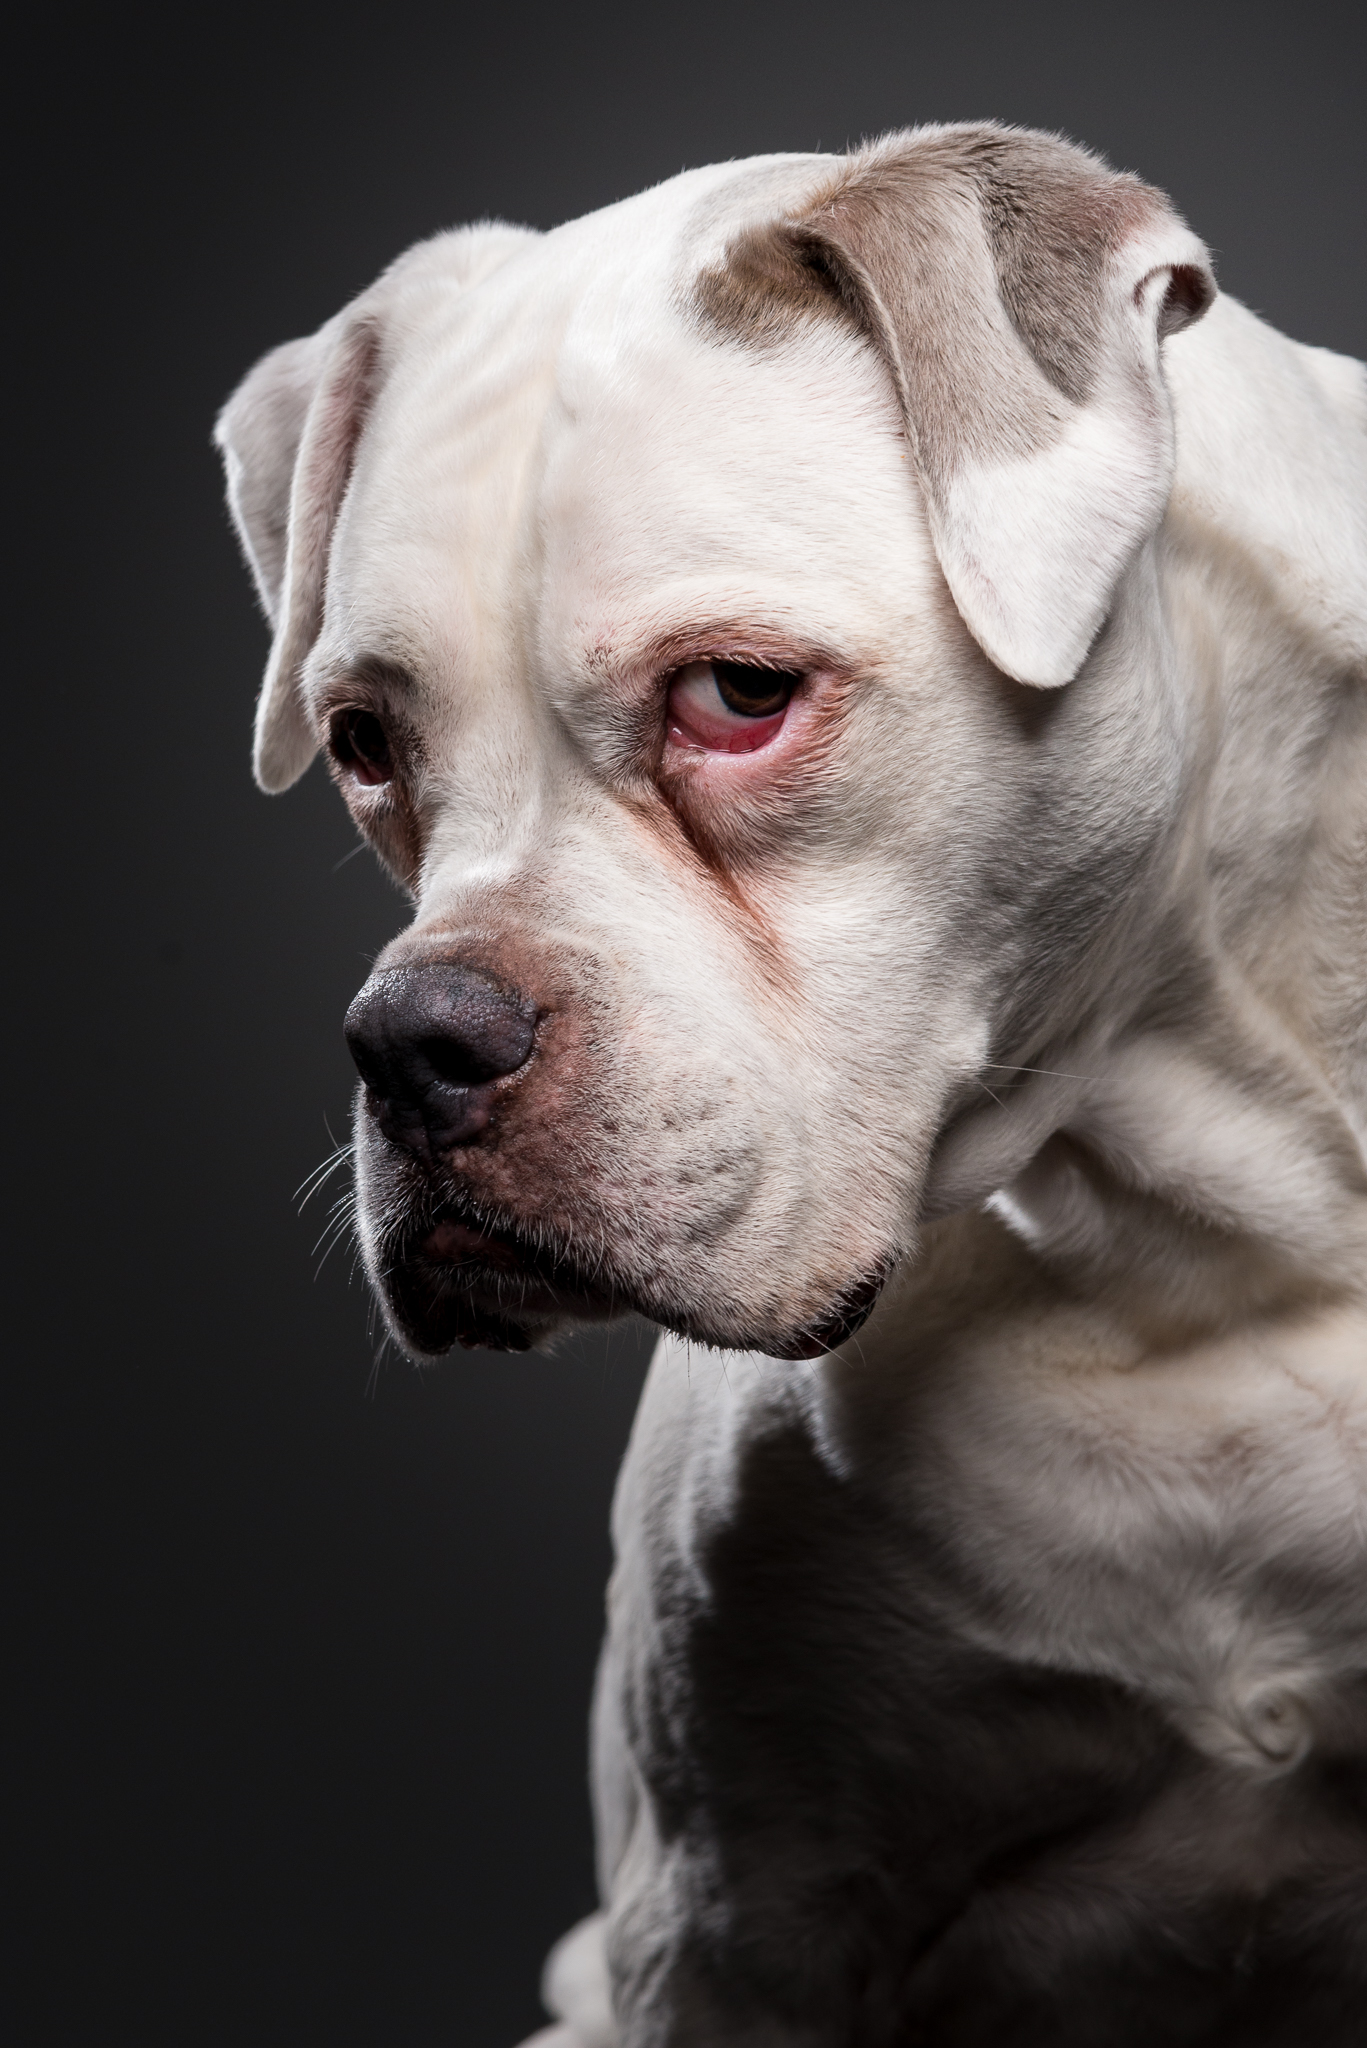 klaus-dyba-dog-photography-american-pitbull